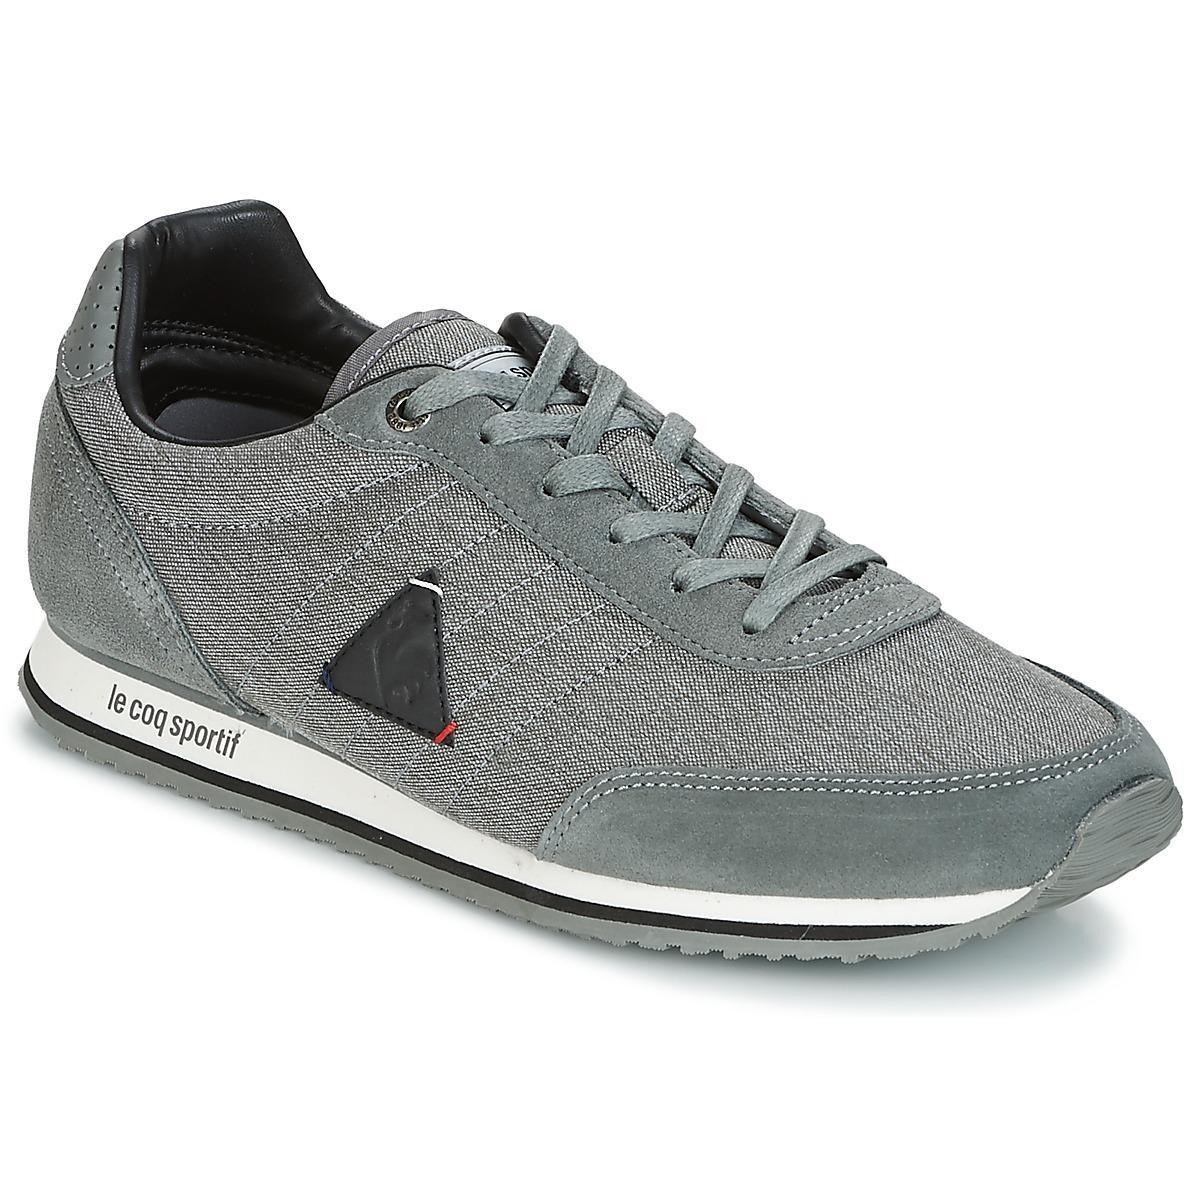 efb079e67db0 Le Coq Sportif - Gray Marsancraft 2 Tones Reflective Shoes (trainers) for  Men -. View fullscreen